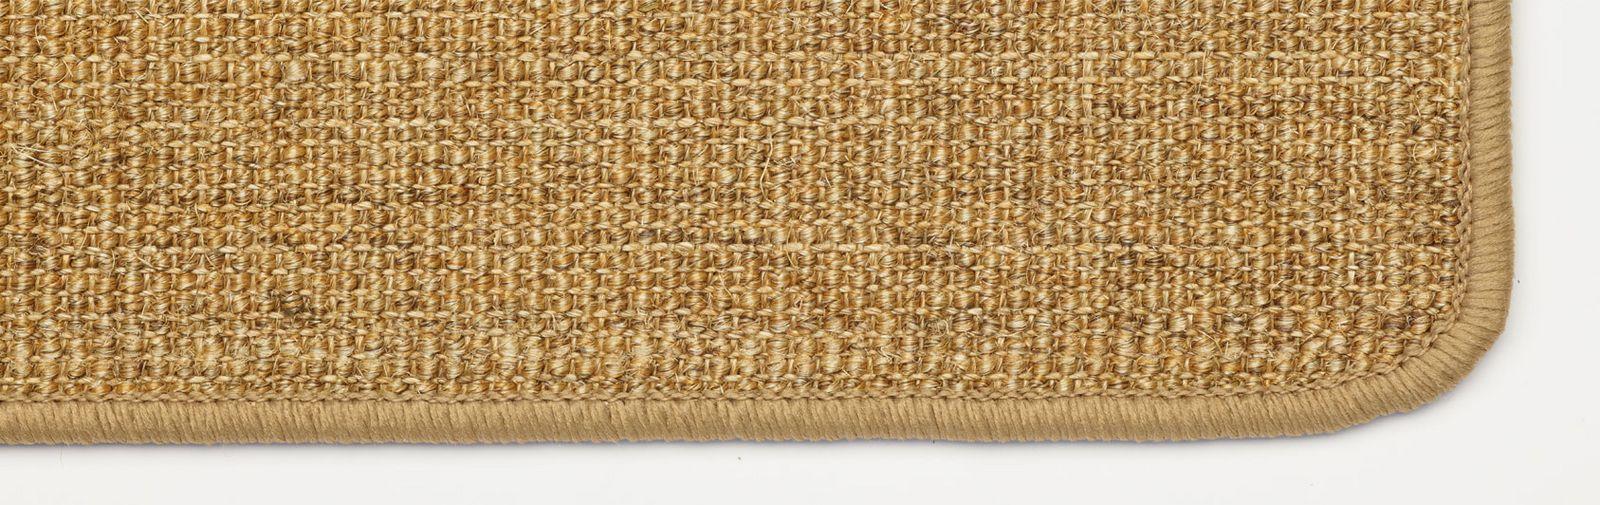 church carpet sisal color tobacco color code 7408